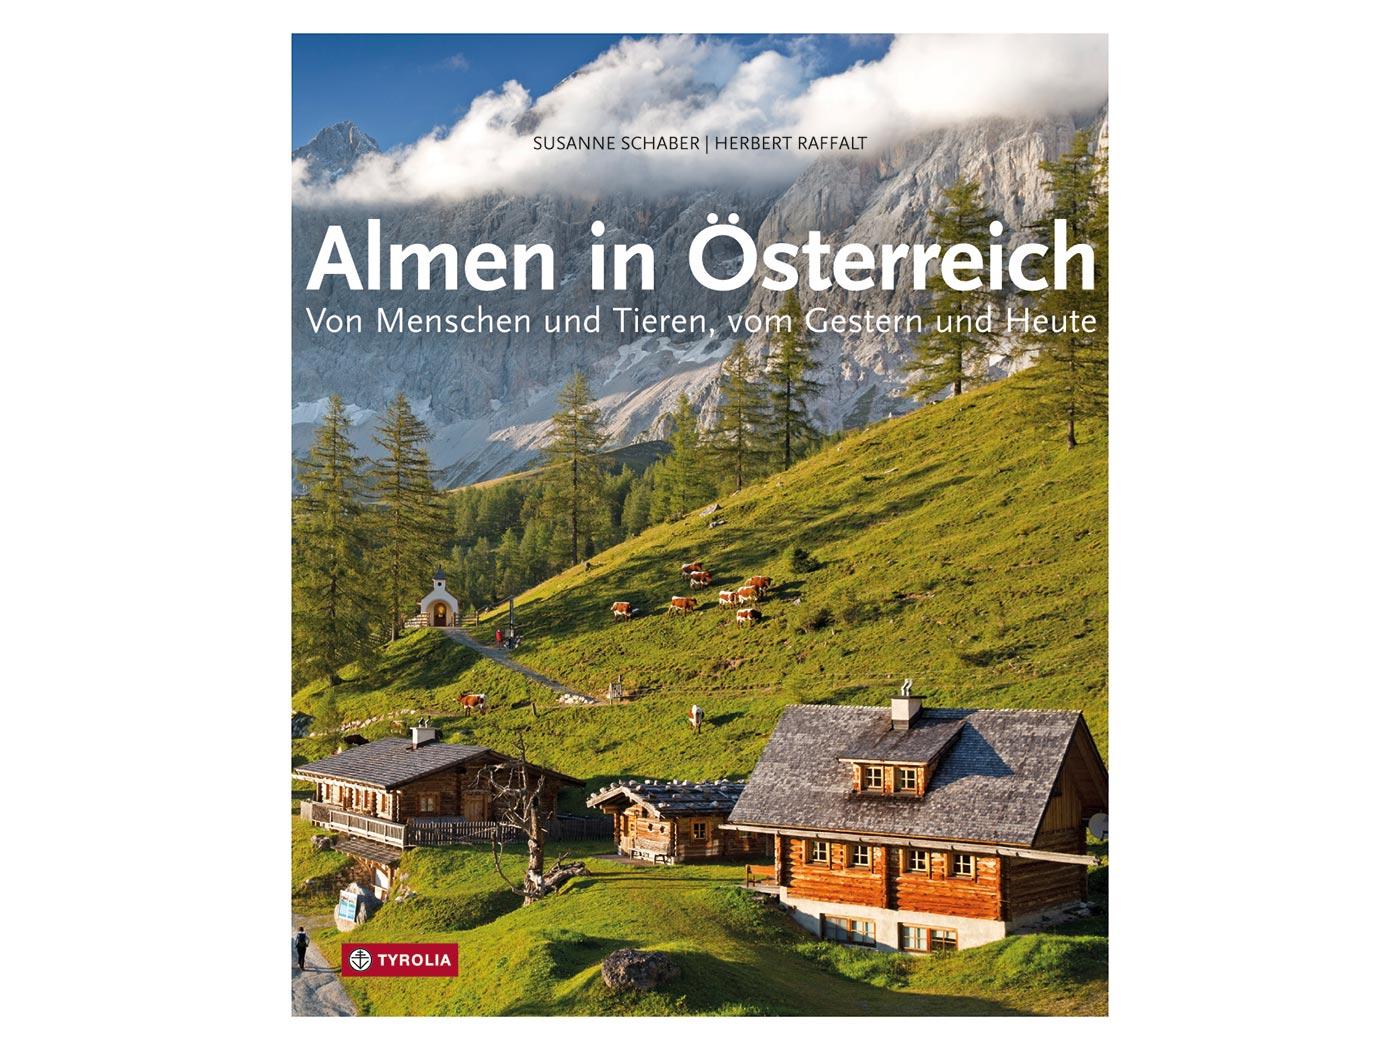 almen-in-oesterreich